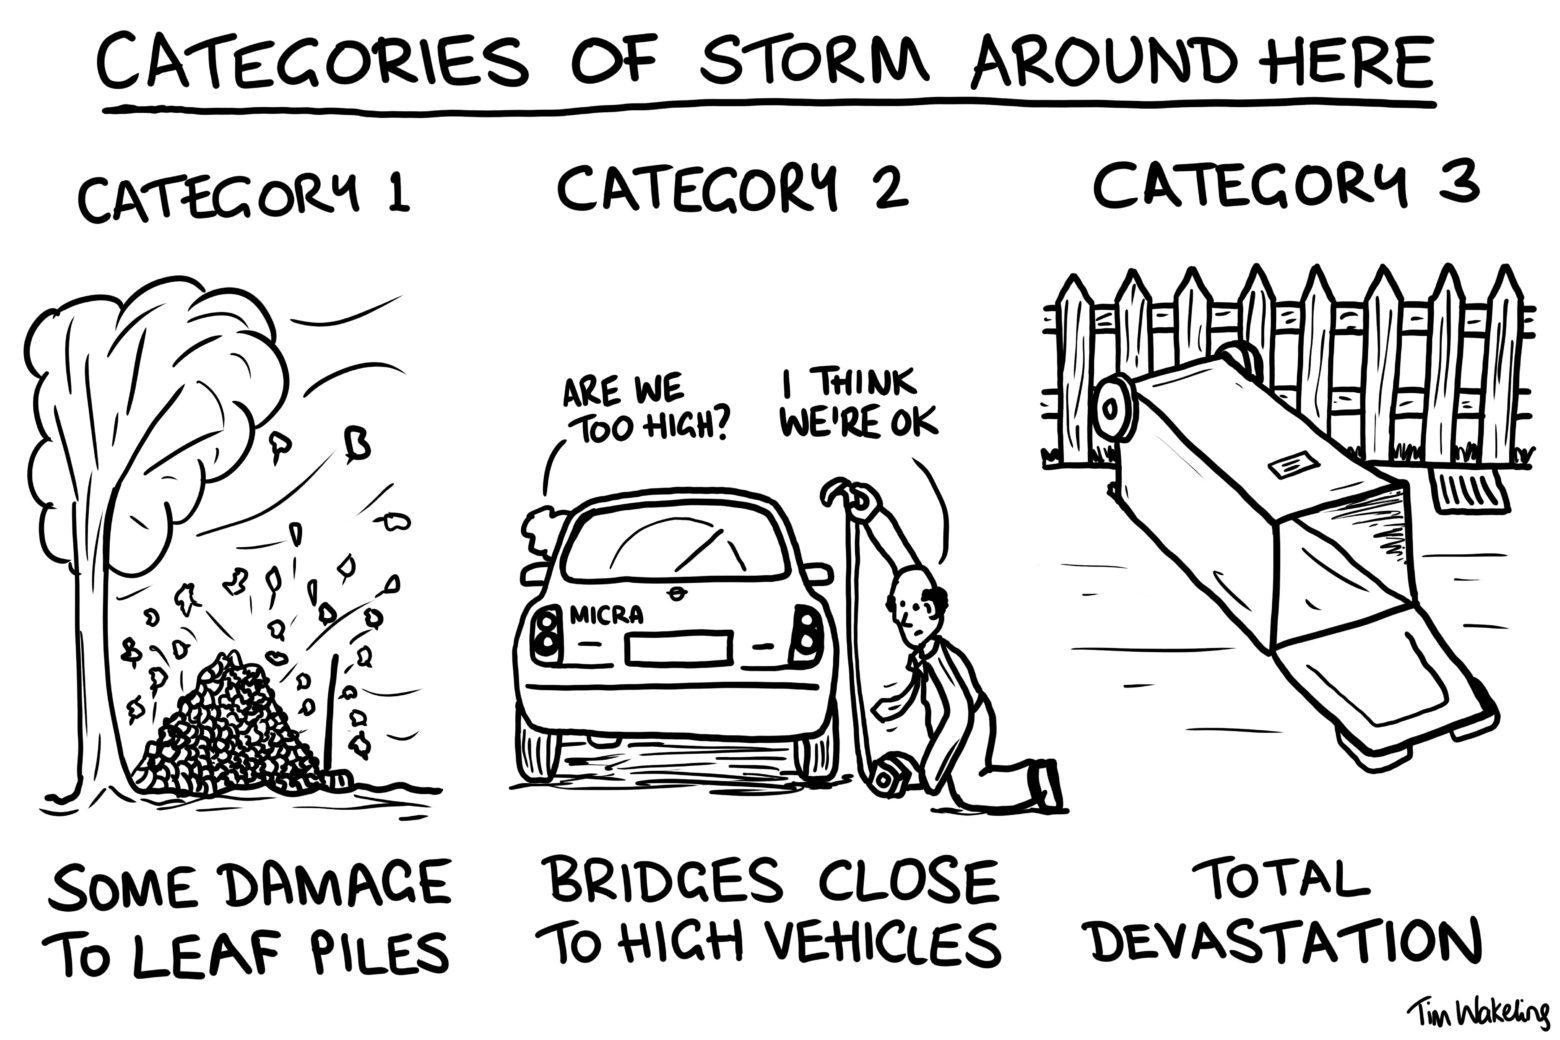 Categories of storm